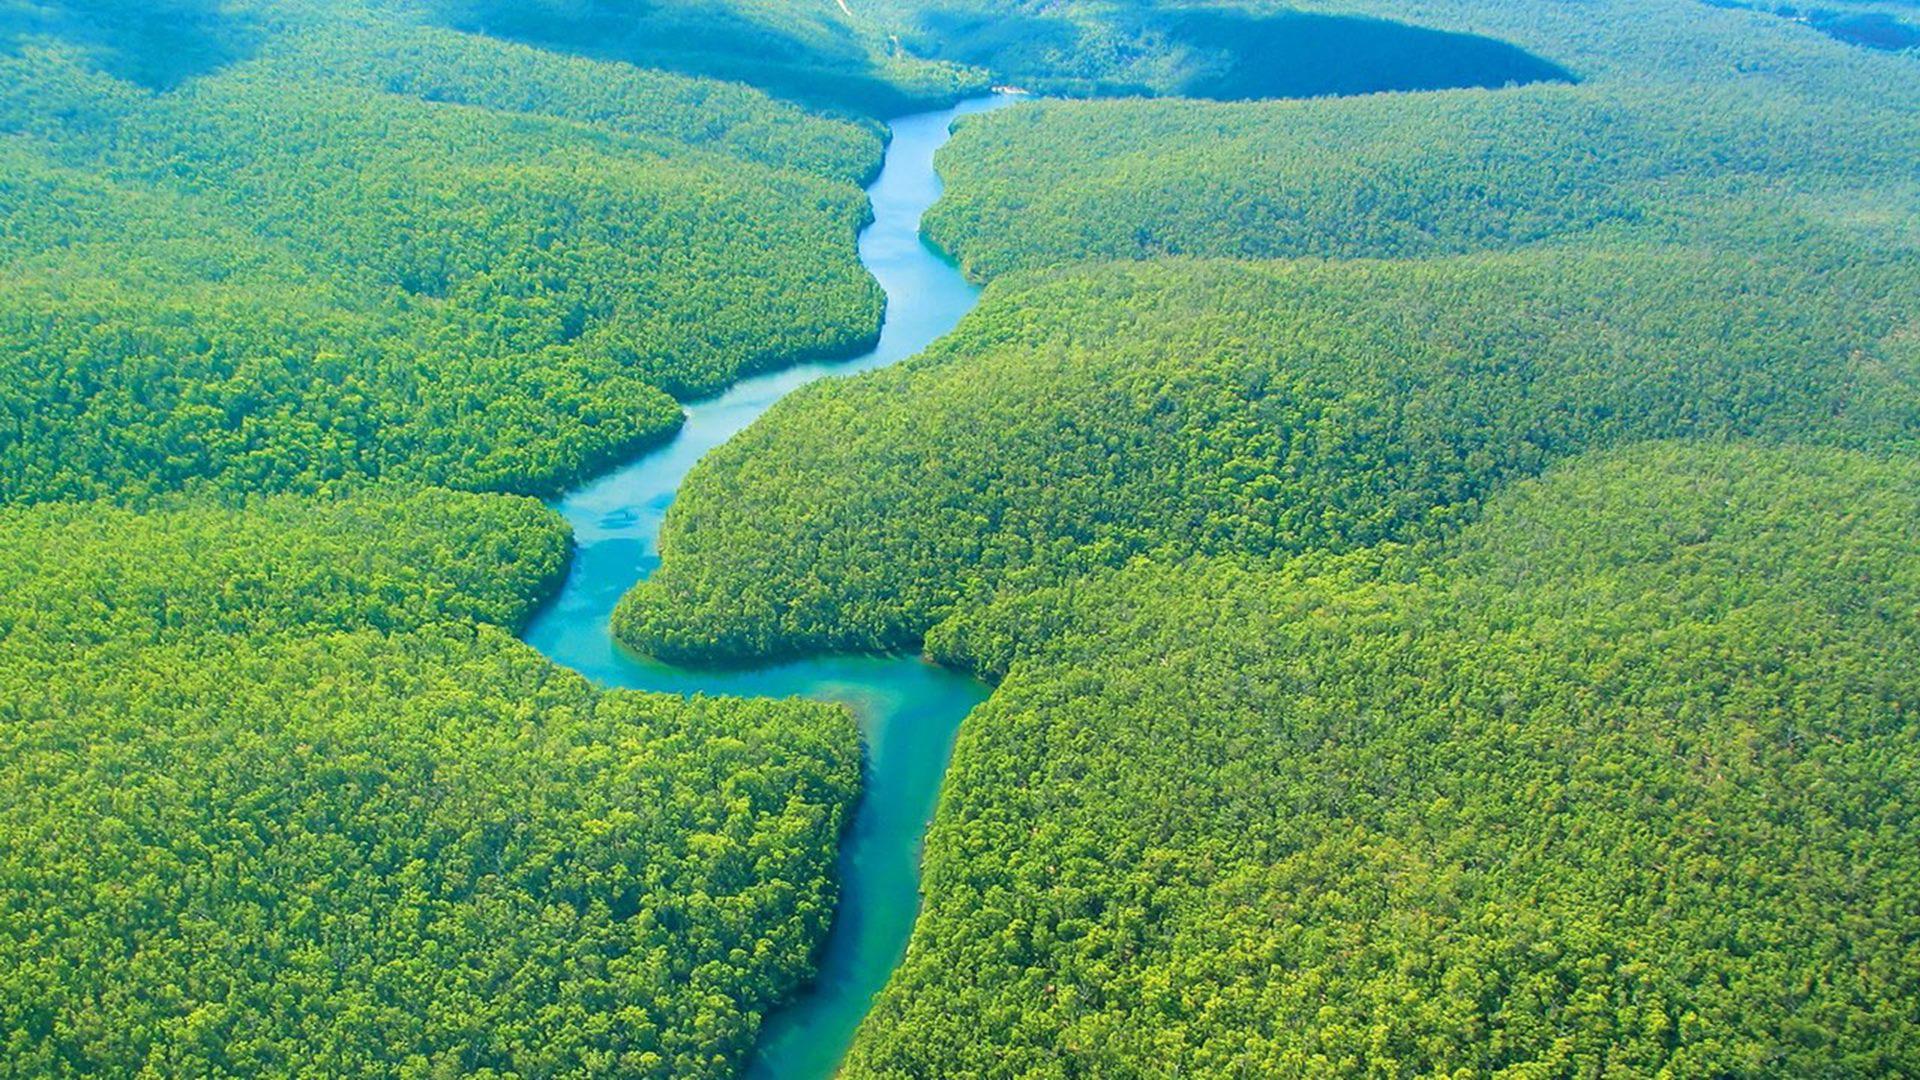 Free download Amazon Rainforest In Brazil HD Wallpaper ...